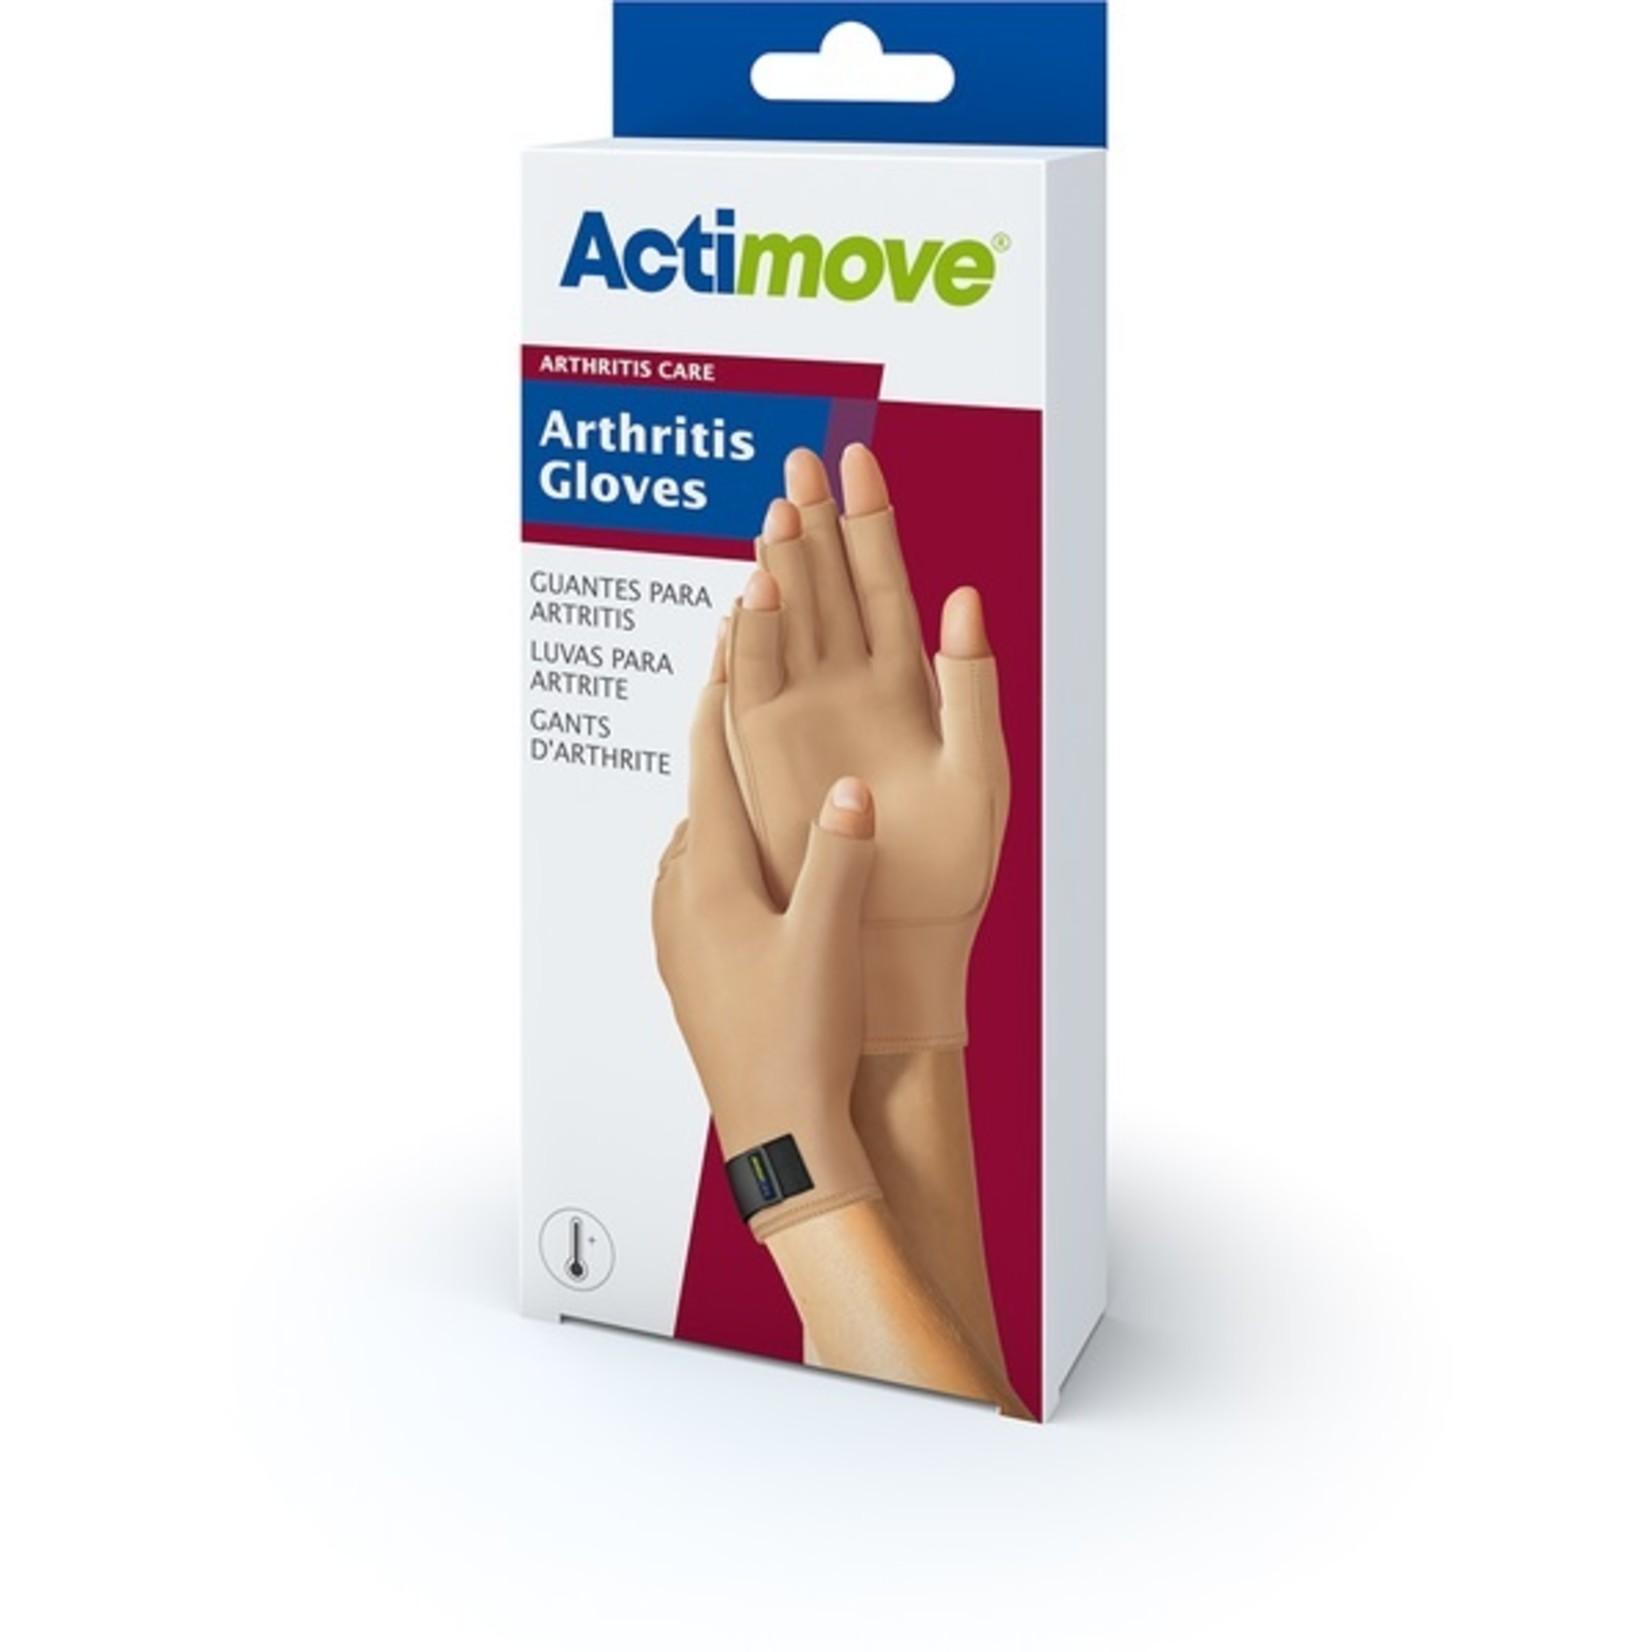 Actimove Actimove Arthritis Gloves